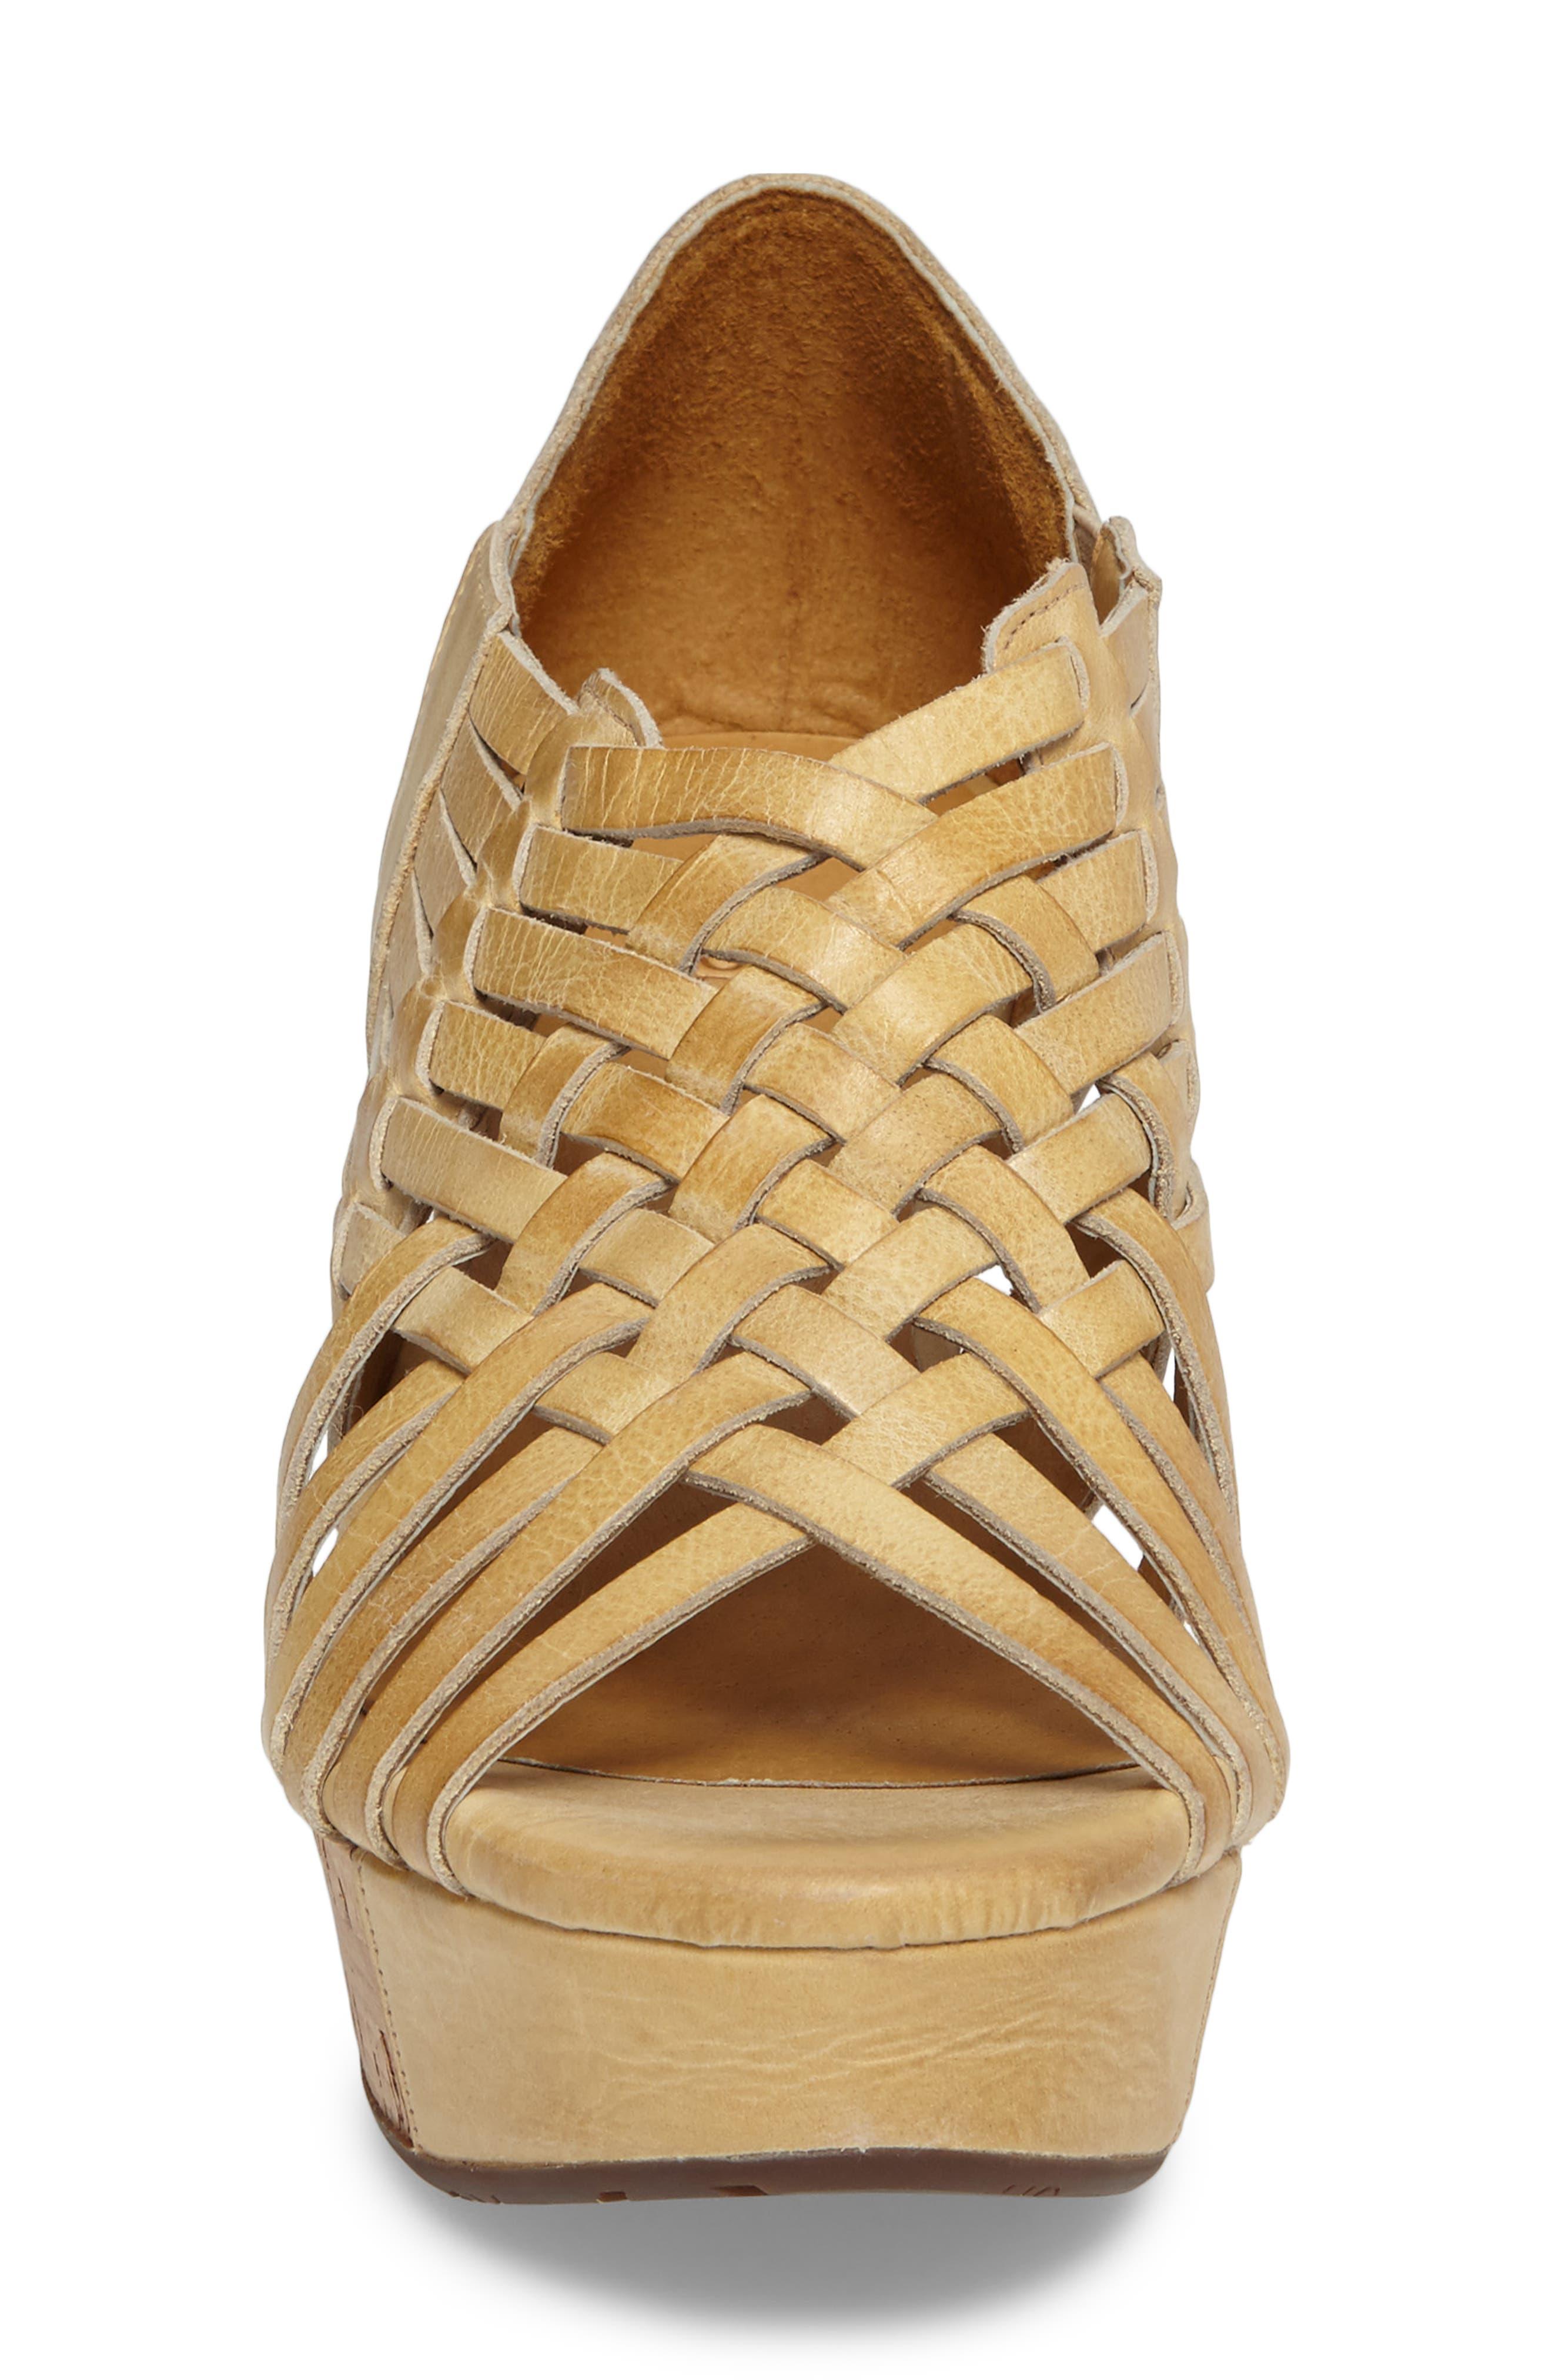 Vic Platform Sandal,                             Alternate thumbnail 3, color,                             Natural Leather